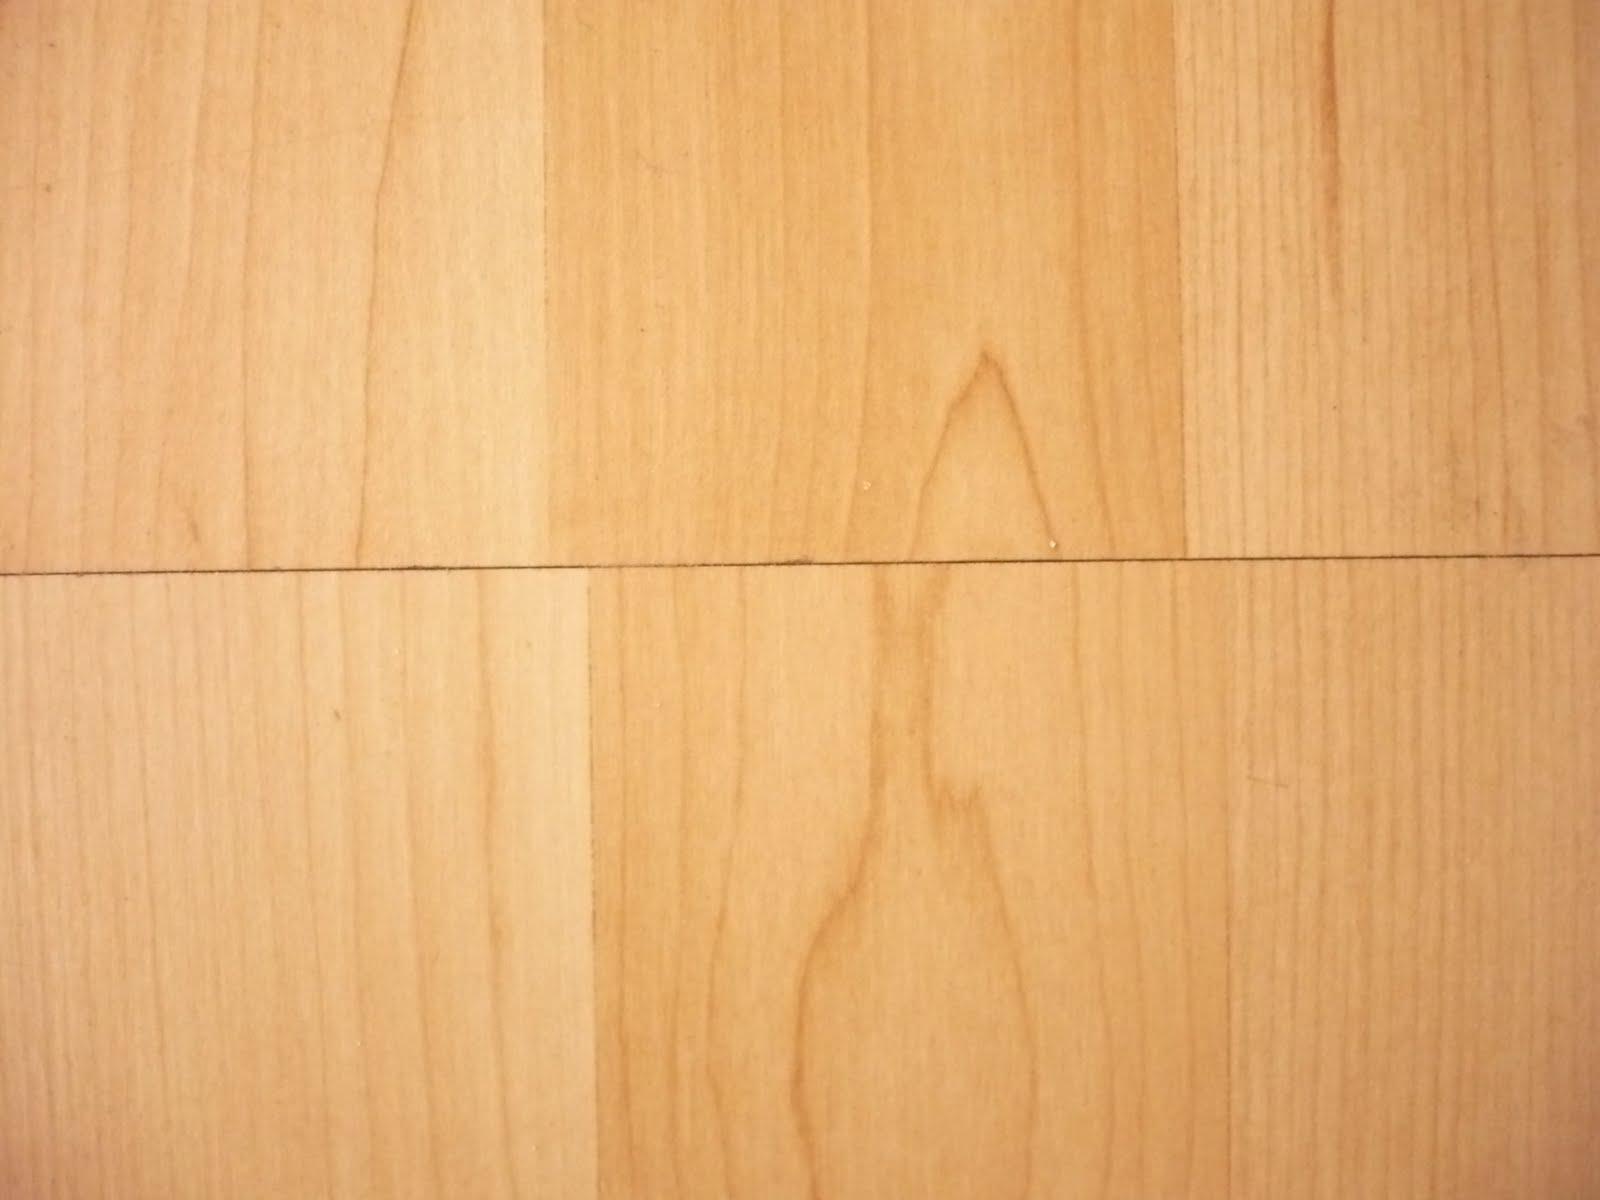 b1 laminat affordable laminat parke kap n profili z. Black Bedroom Furniture Sets. Home Design Ideas